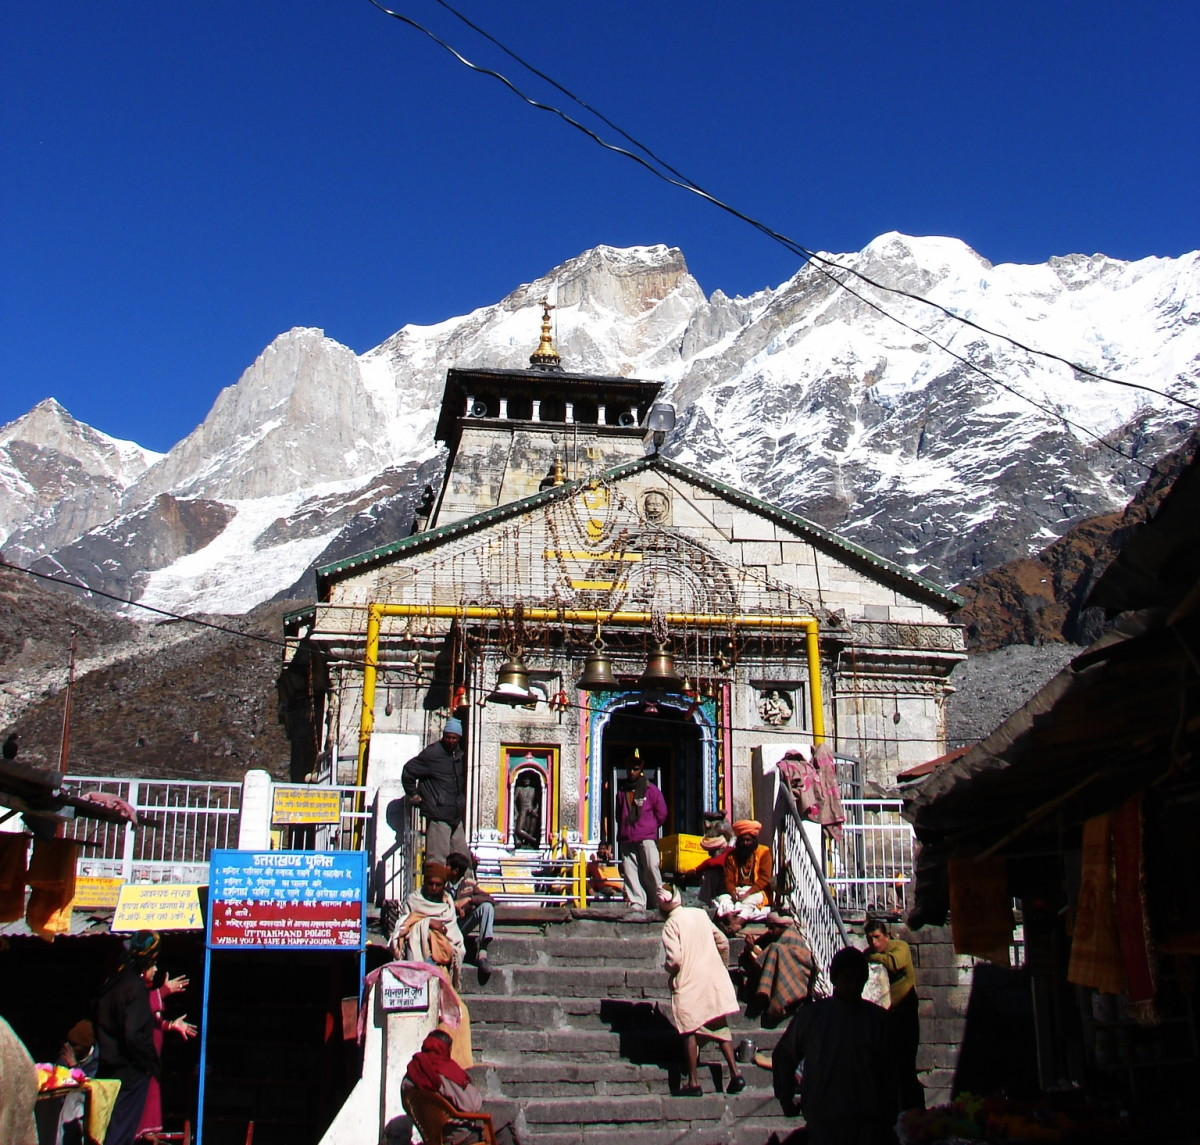 Kedarnath temple -- 30.7352 degrees North, 79.0669 degrees East